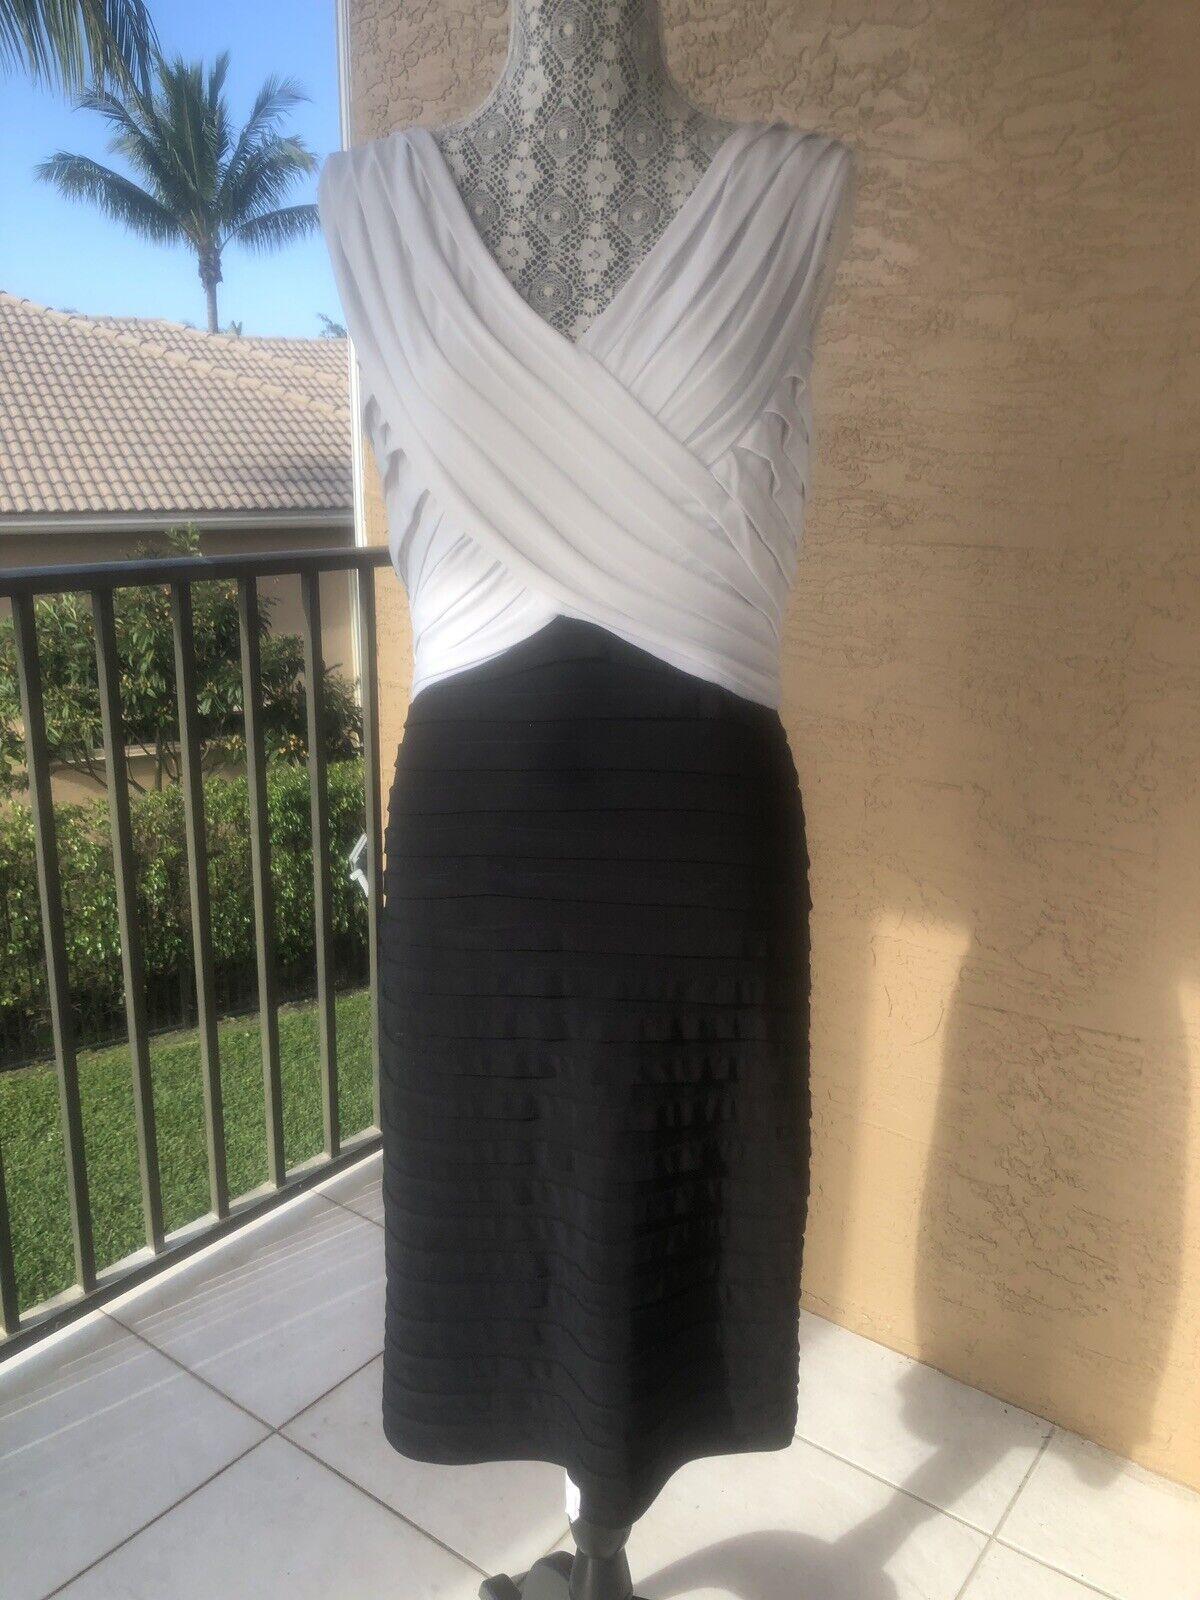 LADIES SIZE 8 SCARLETT NITE BLACK & WHITE RUCHED KNEE LENGTH COCKTAIL DRESS